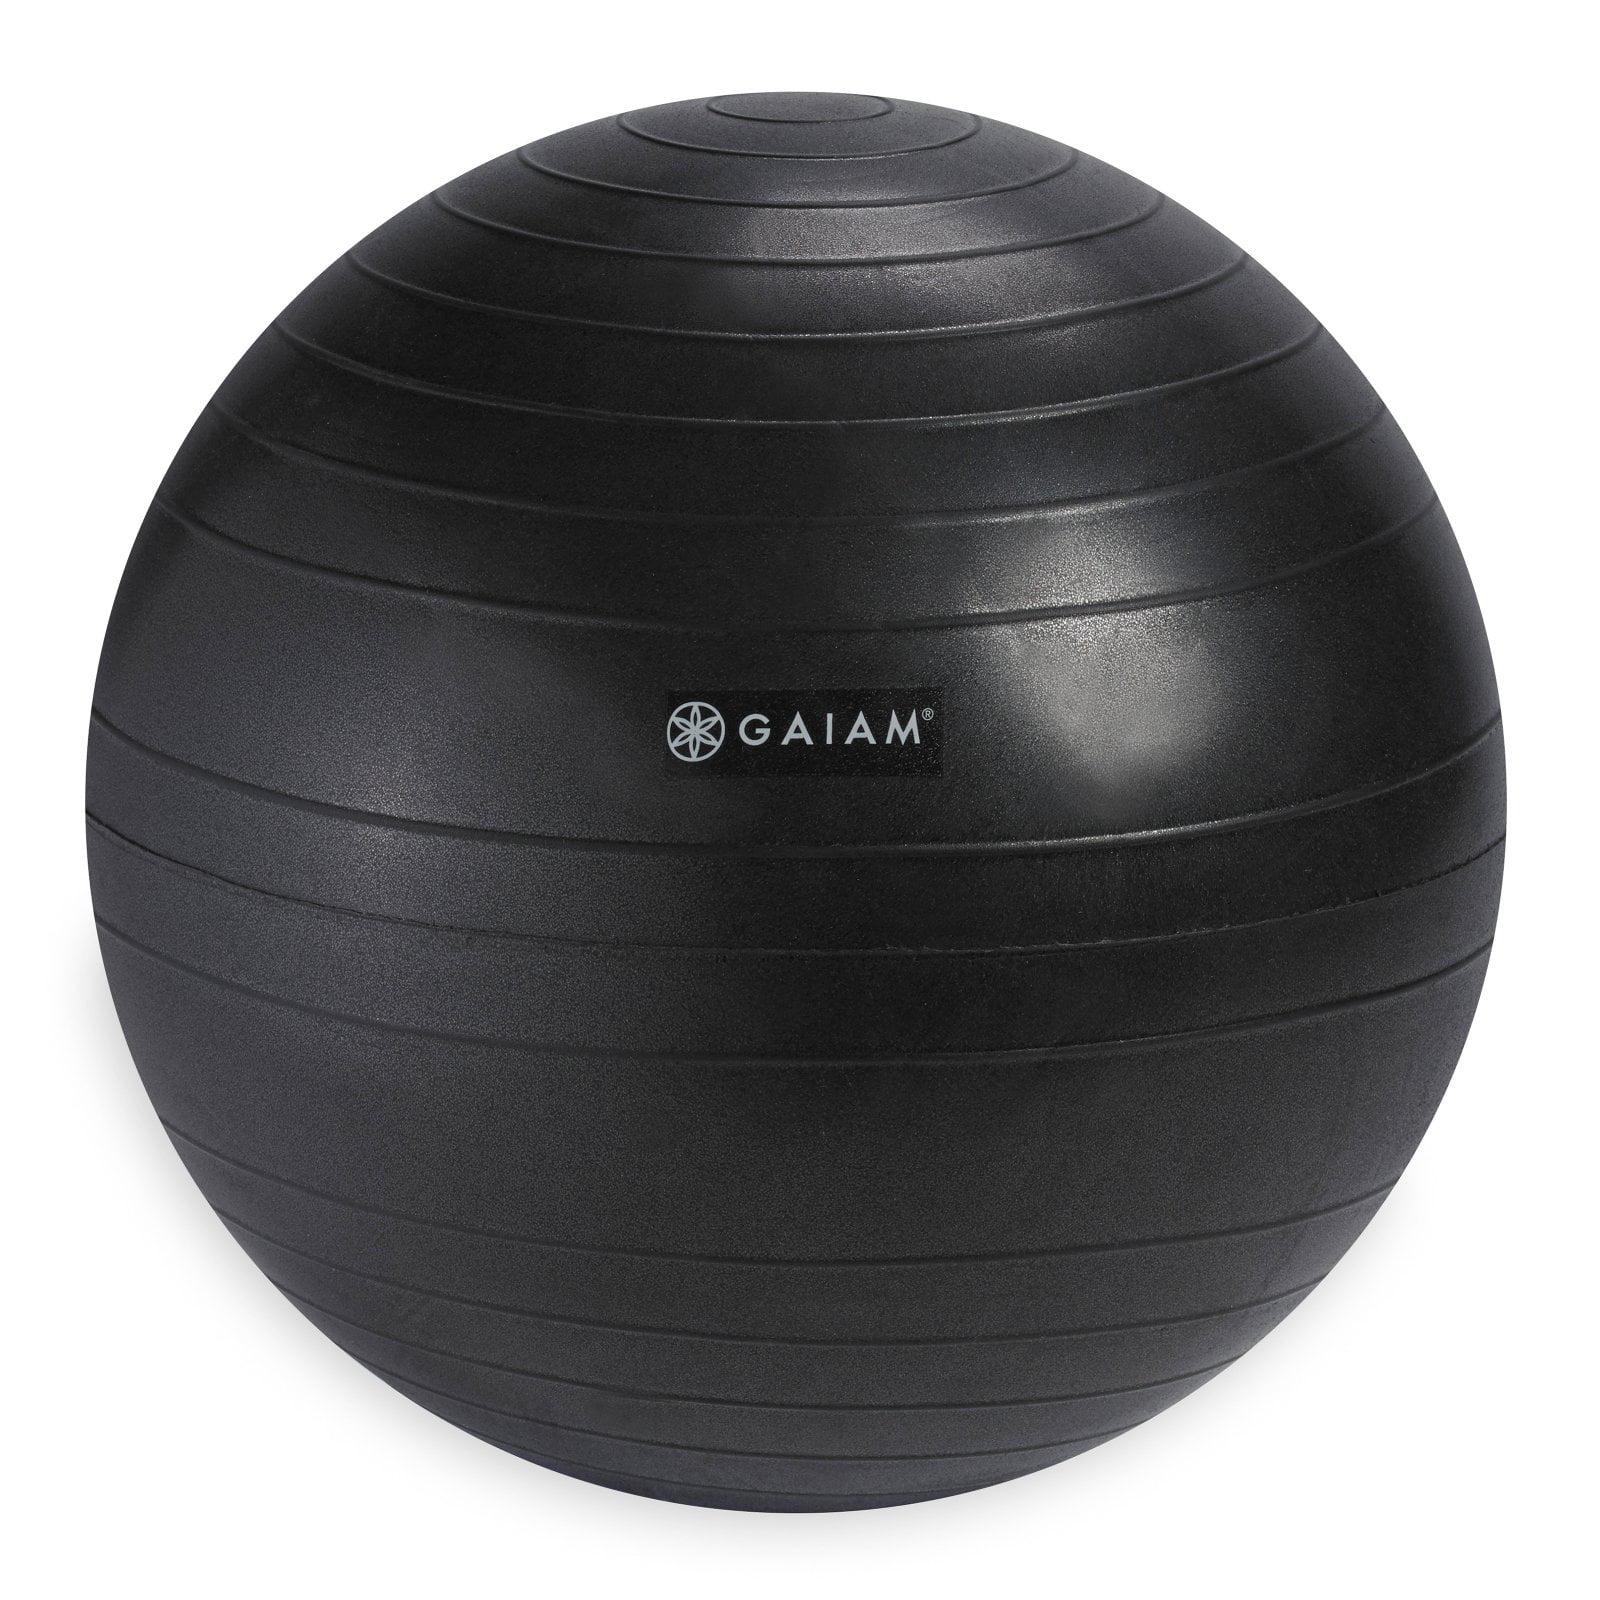 Gaiam Balance Ball Chair Replacement Ball, Charcoal, 52cm